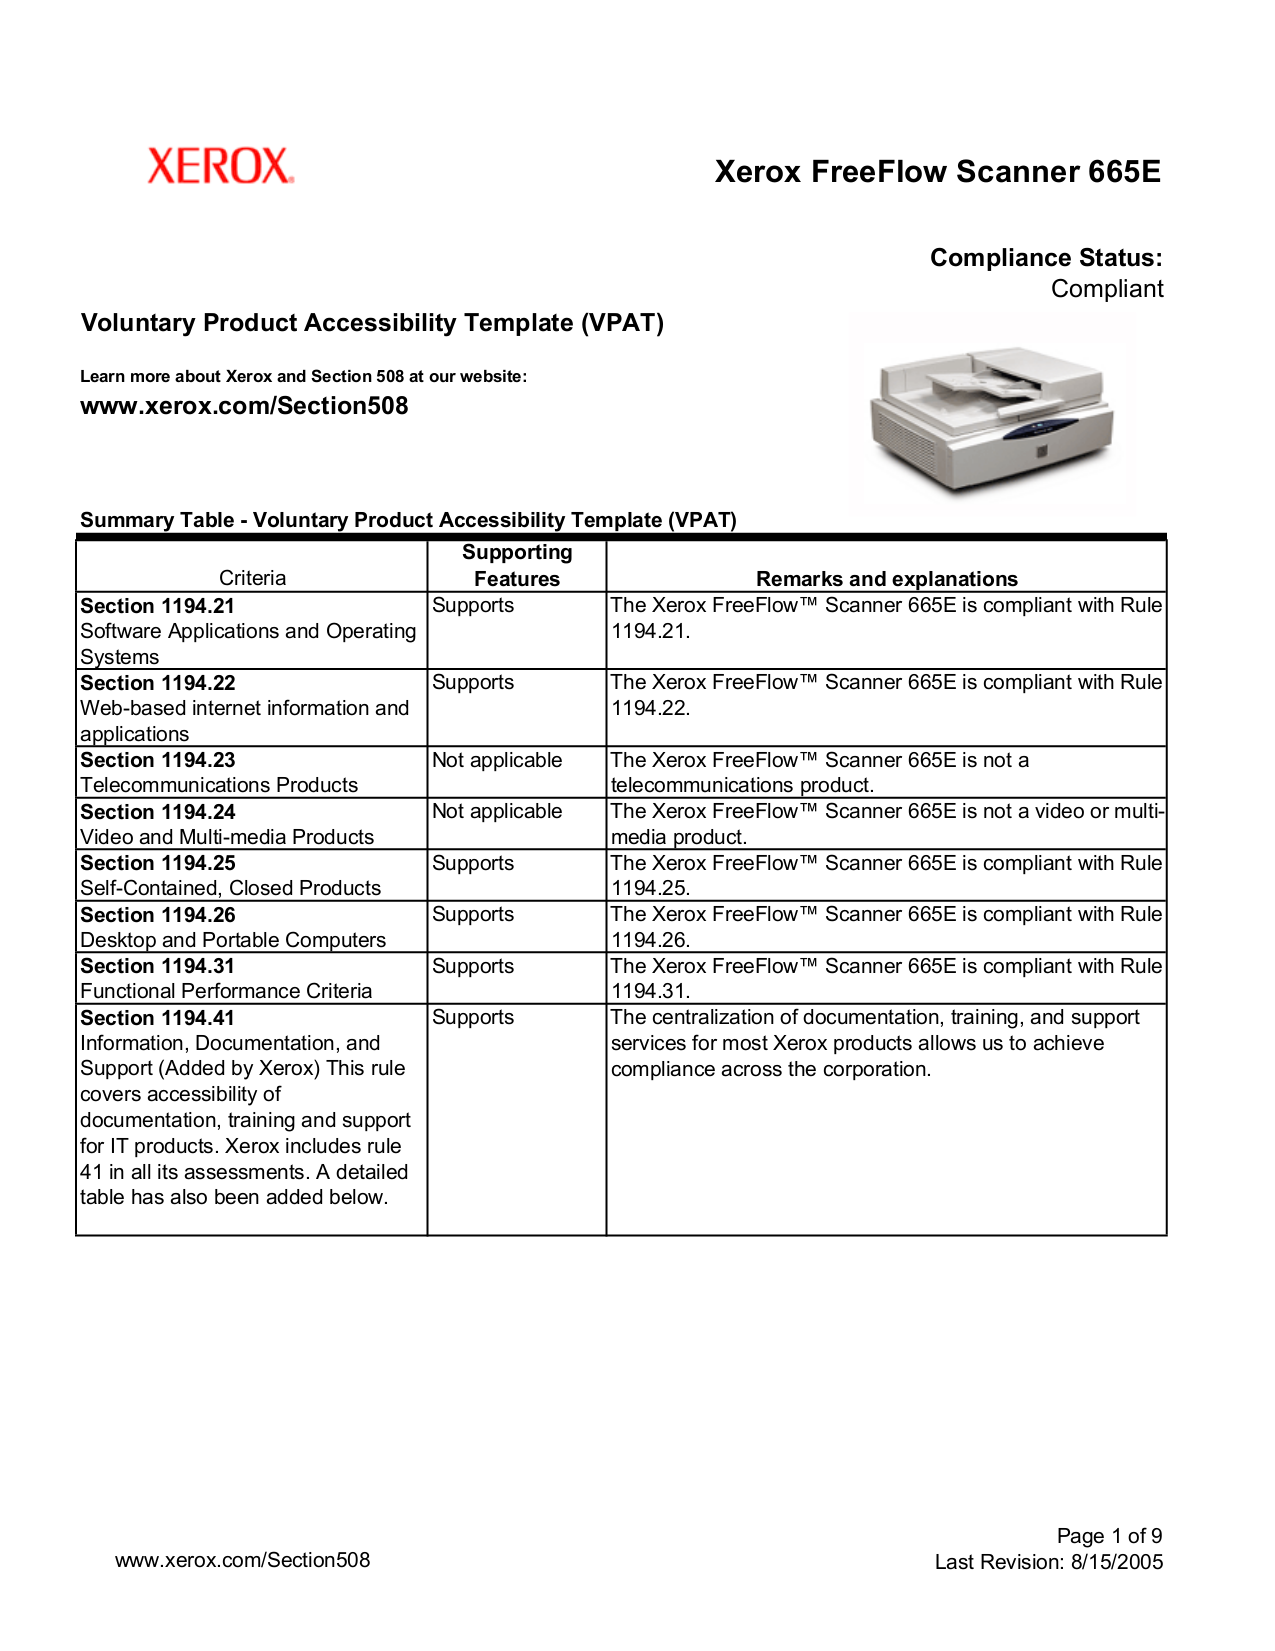 pdf for Xerox Scanner FreeFlow 665E manual